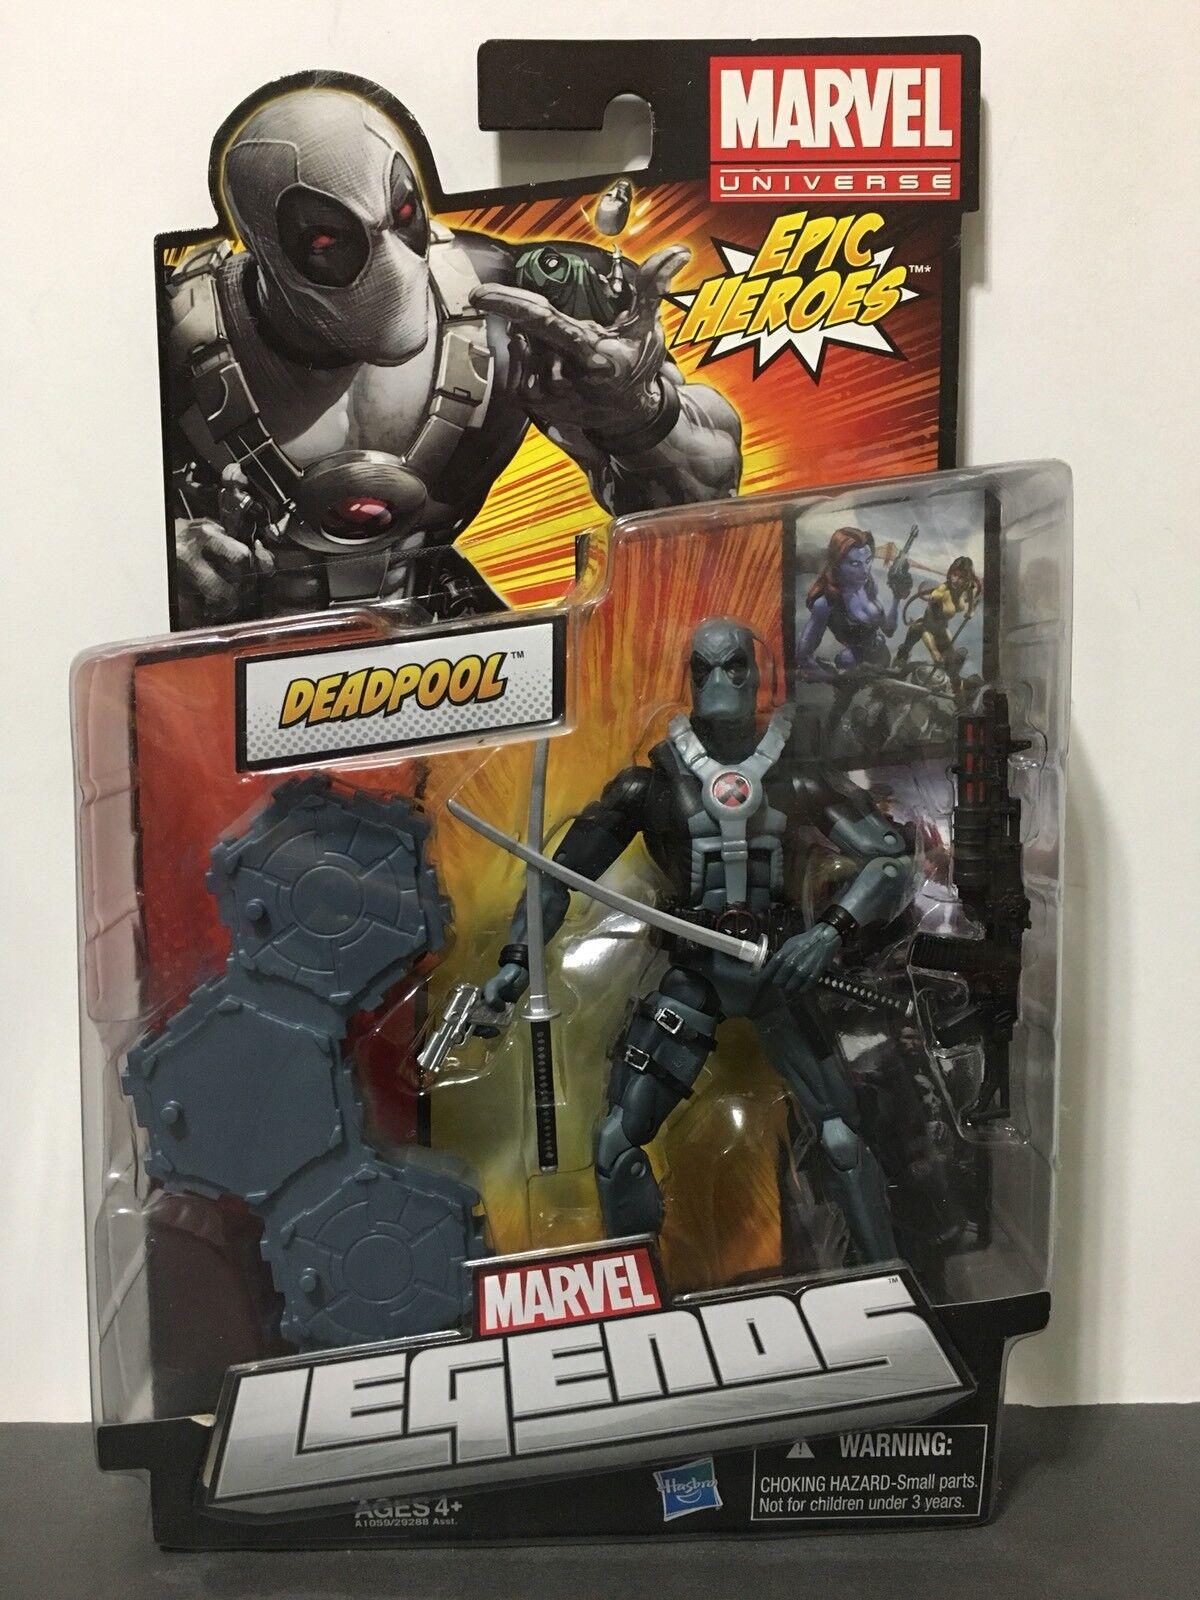 Marvel Legends Epic Heroes X-Force Deadpool 6  Action Figure Hasbro MIP